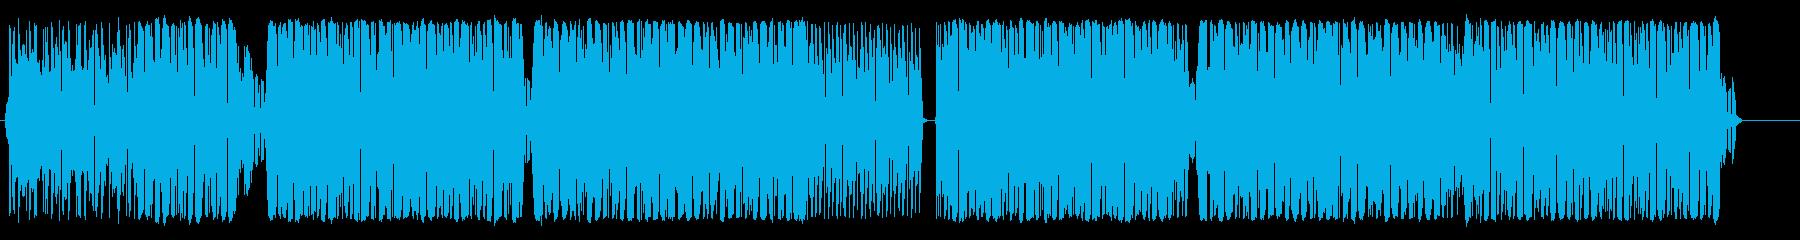 Bouncy, cheerful, ukulele, whistling's reproduced waveform